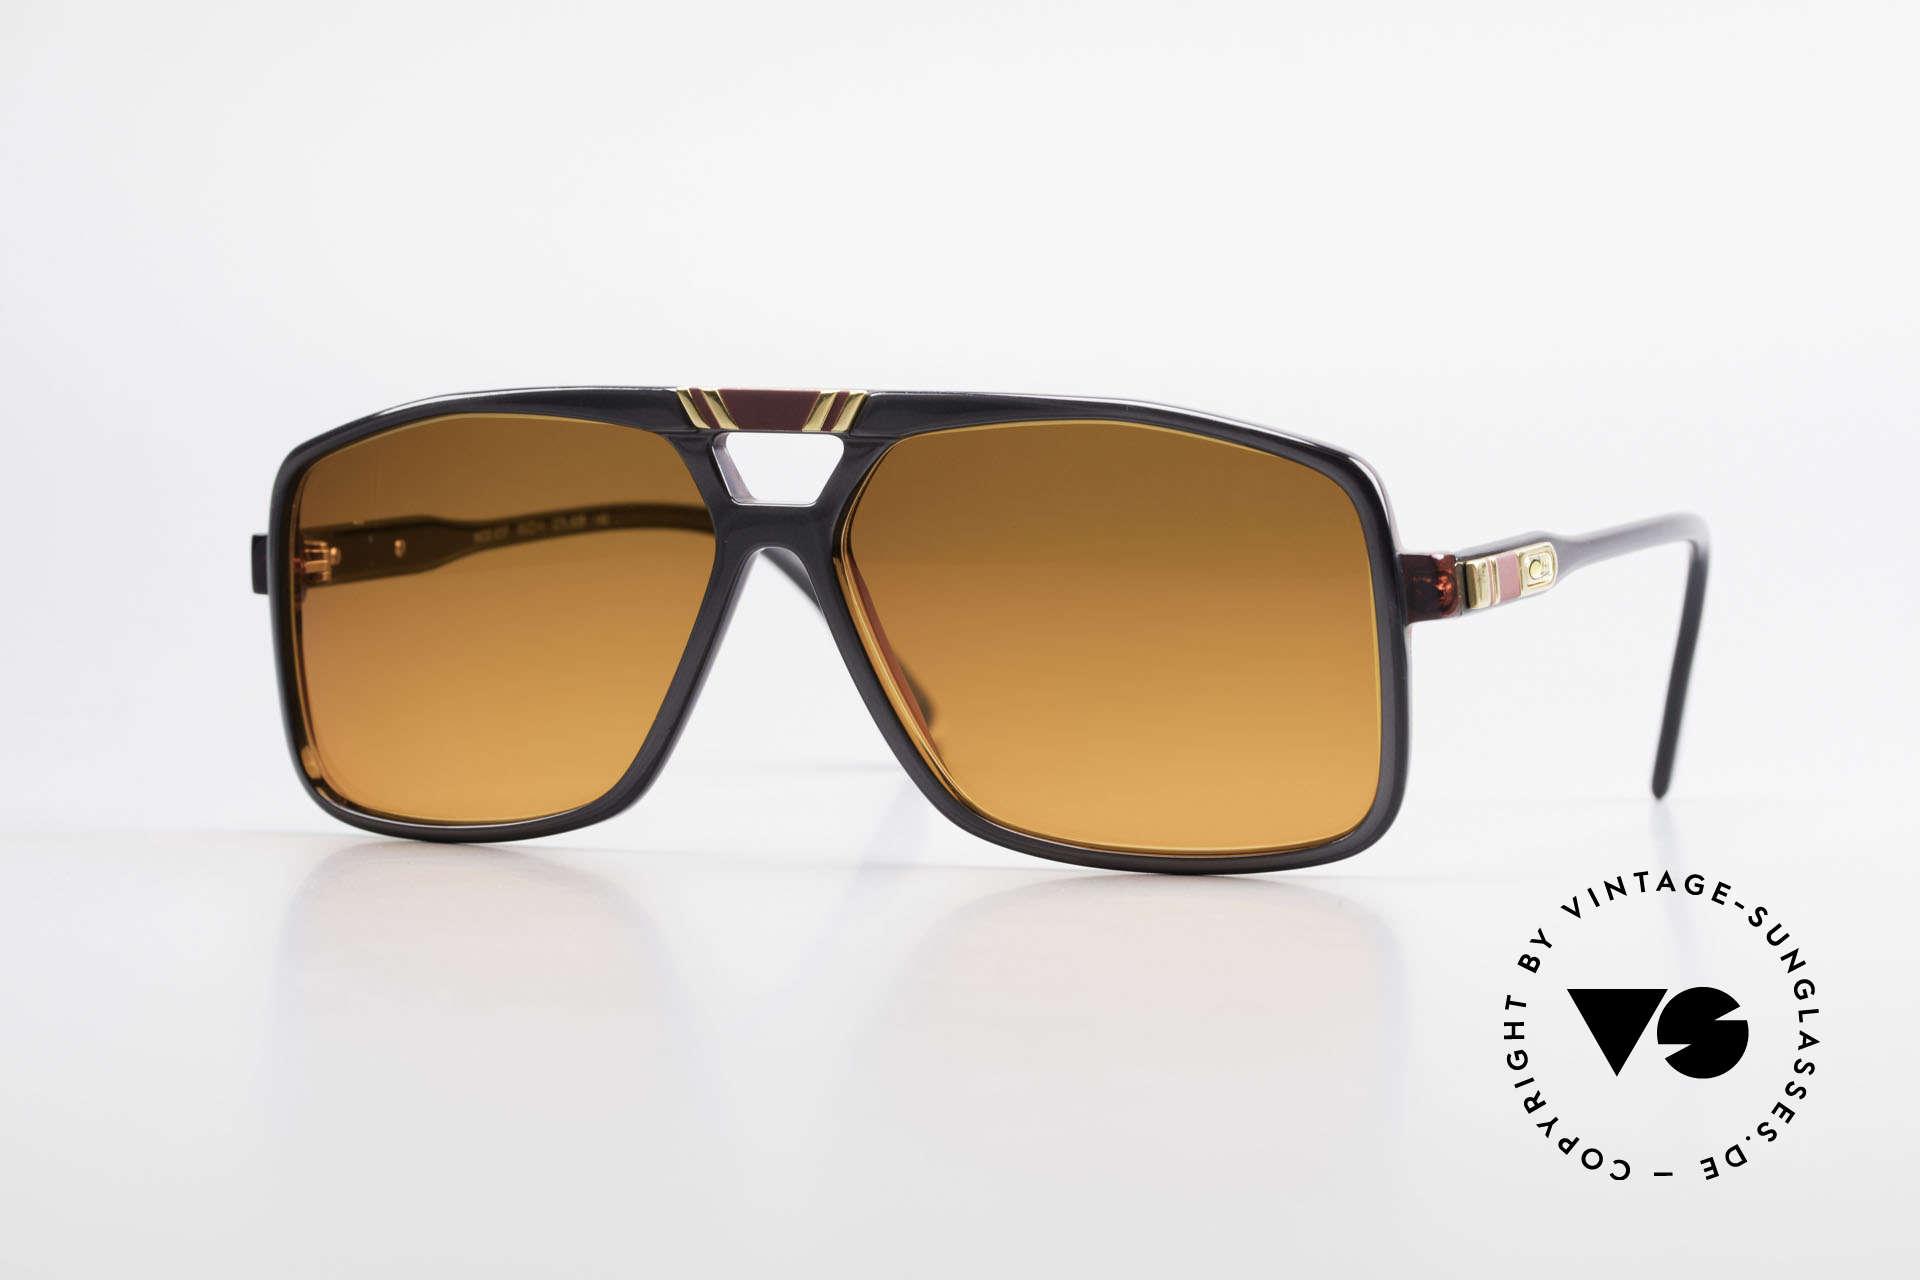 Cazal 637 80's Hip Hop Shades Sunset, West Germany Cazal VINTAGE designer sunglasses, Made for Men